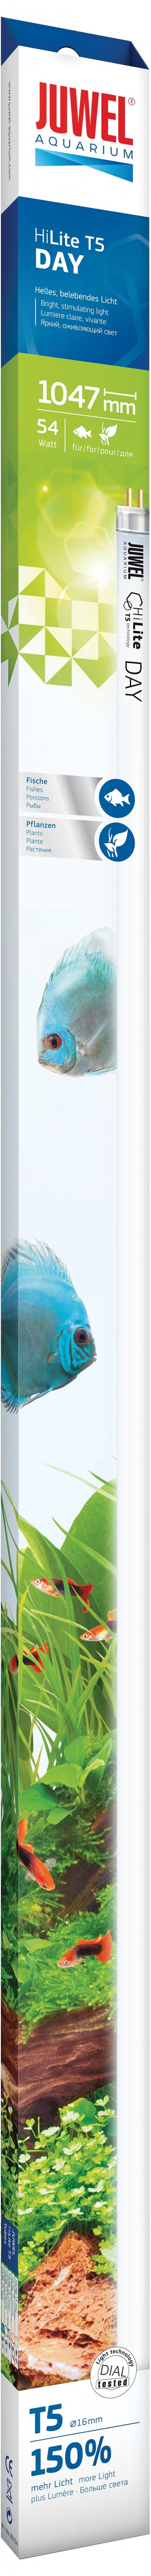 Лампа для аквариума - High-Lite Day T5 54W 1047mm title=